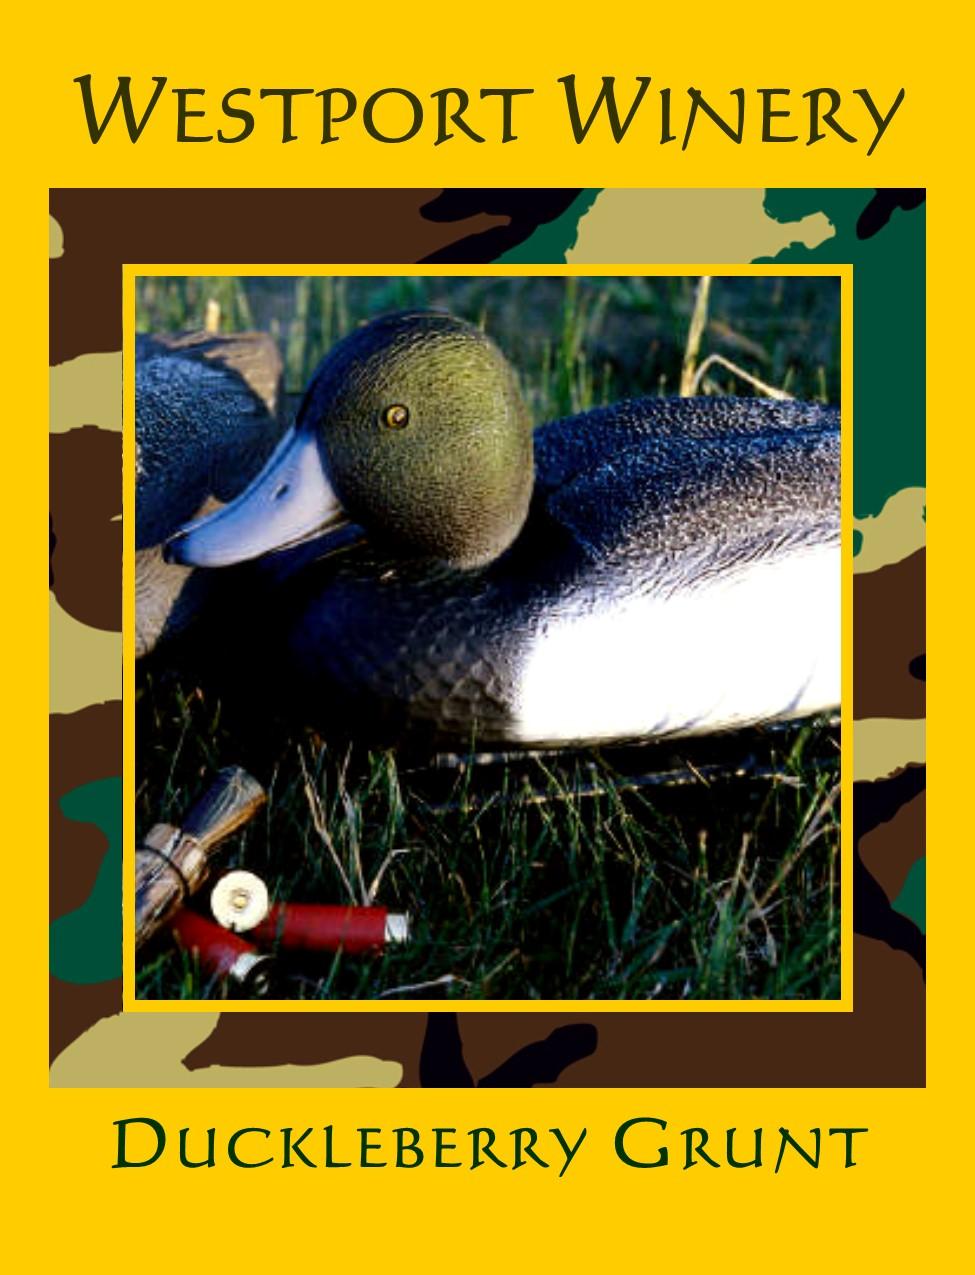 2013 Duck Poster